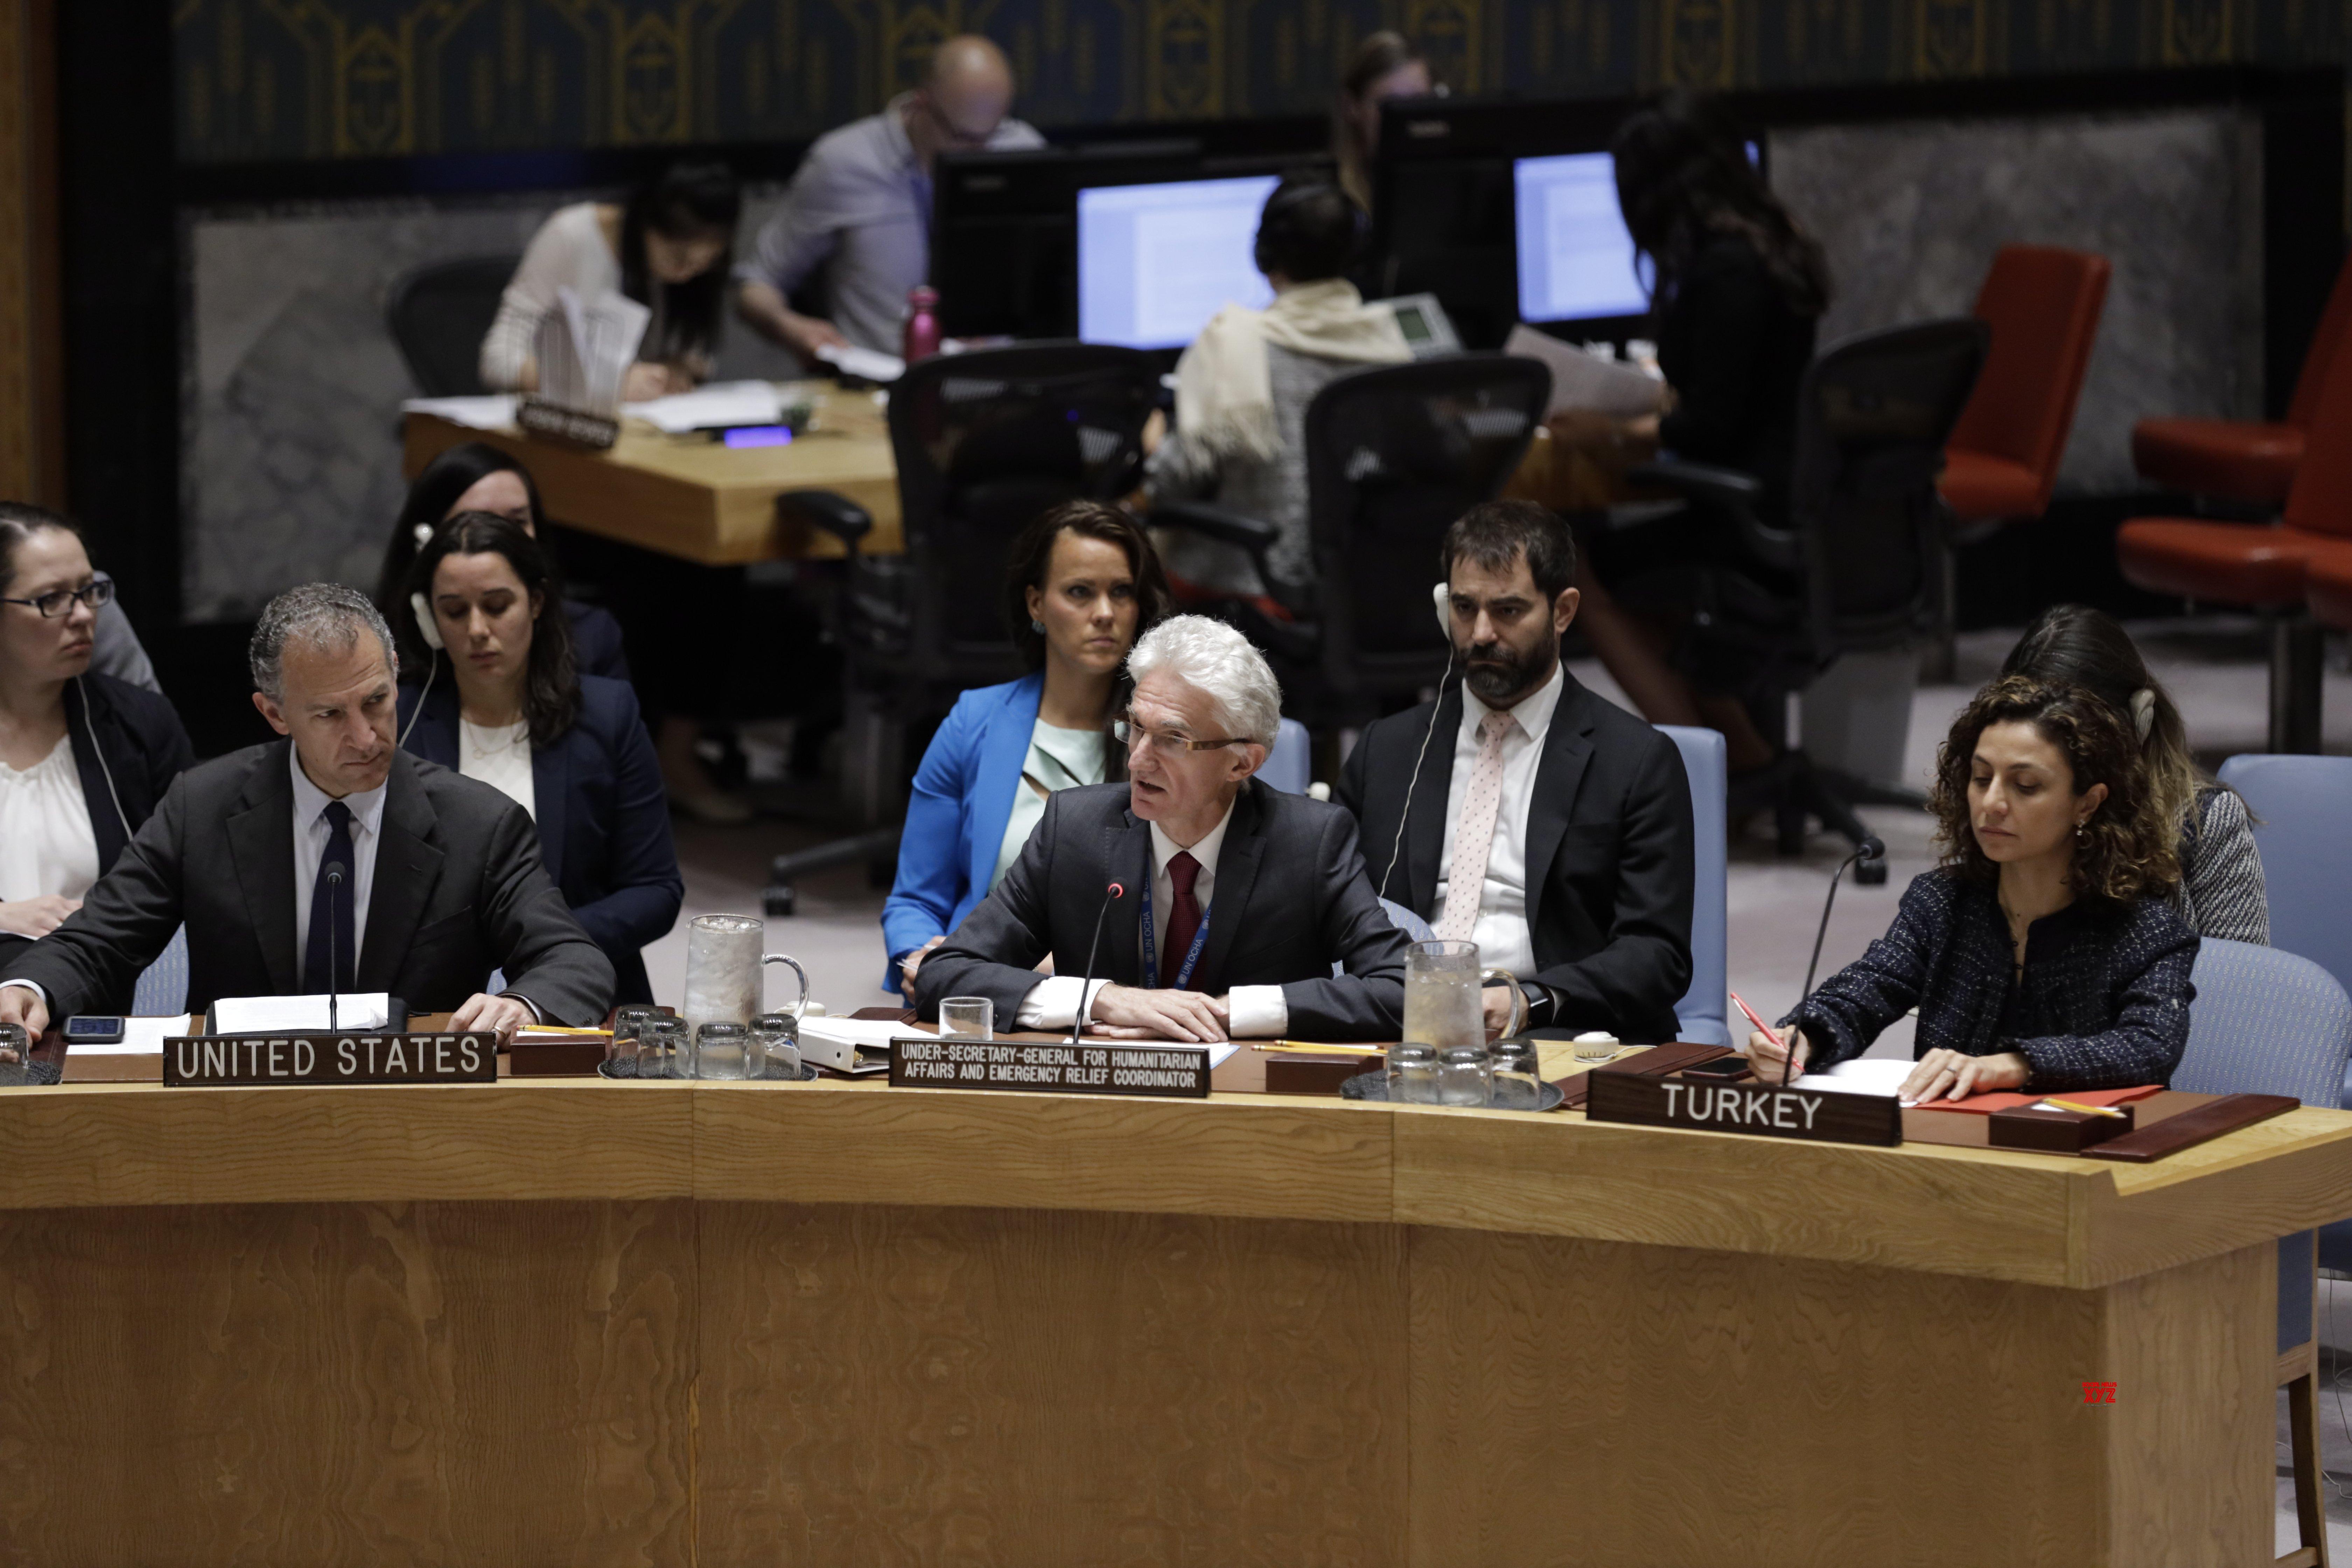 UN - SECURITY COUNCIL - MEETING - SYRIA #Gallery